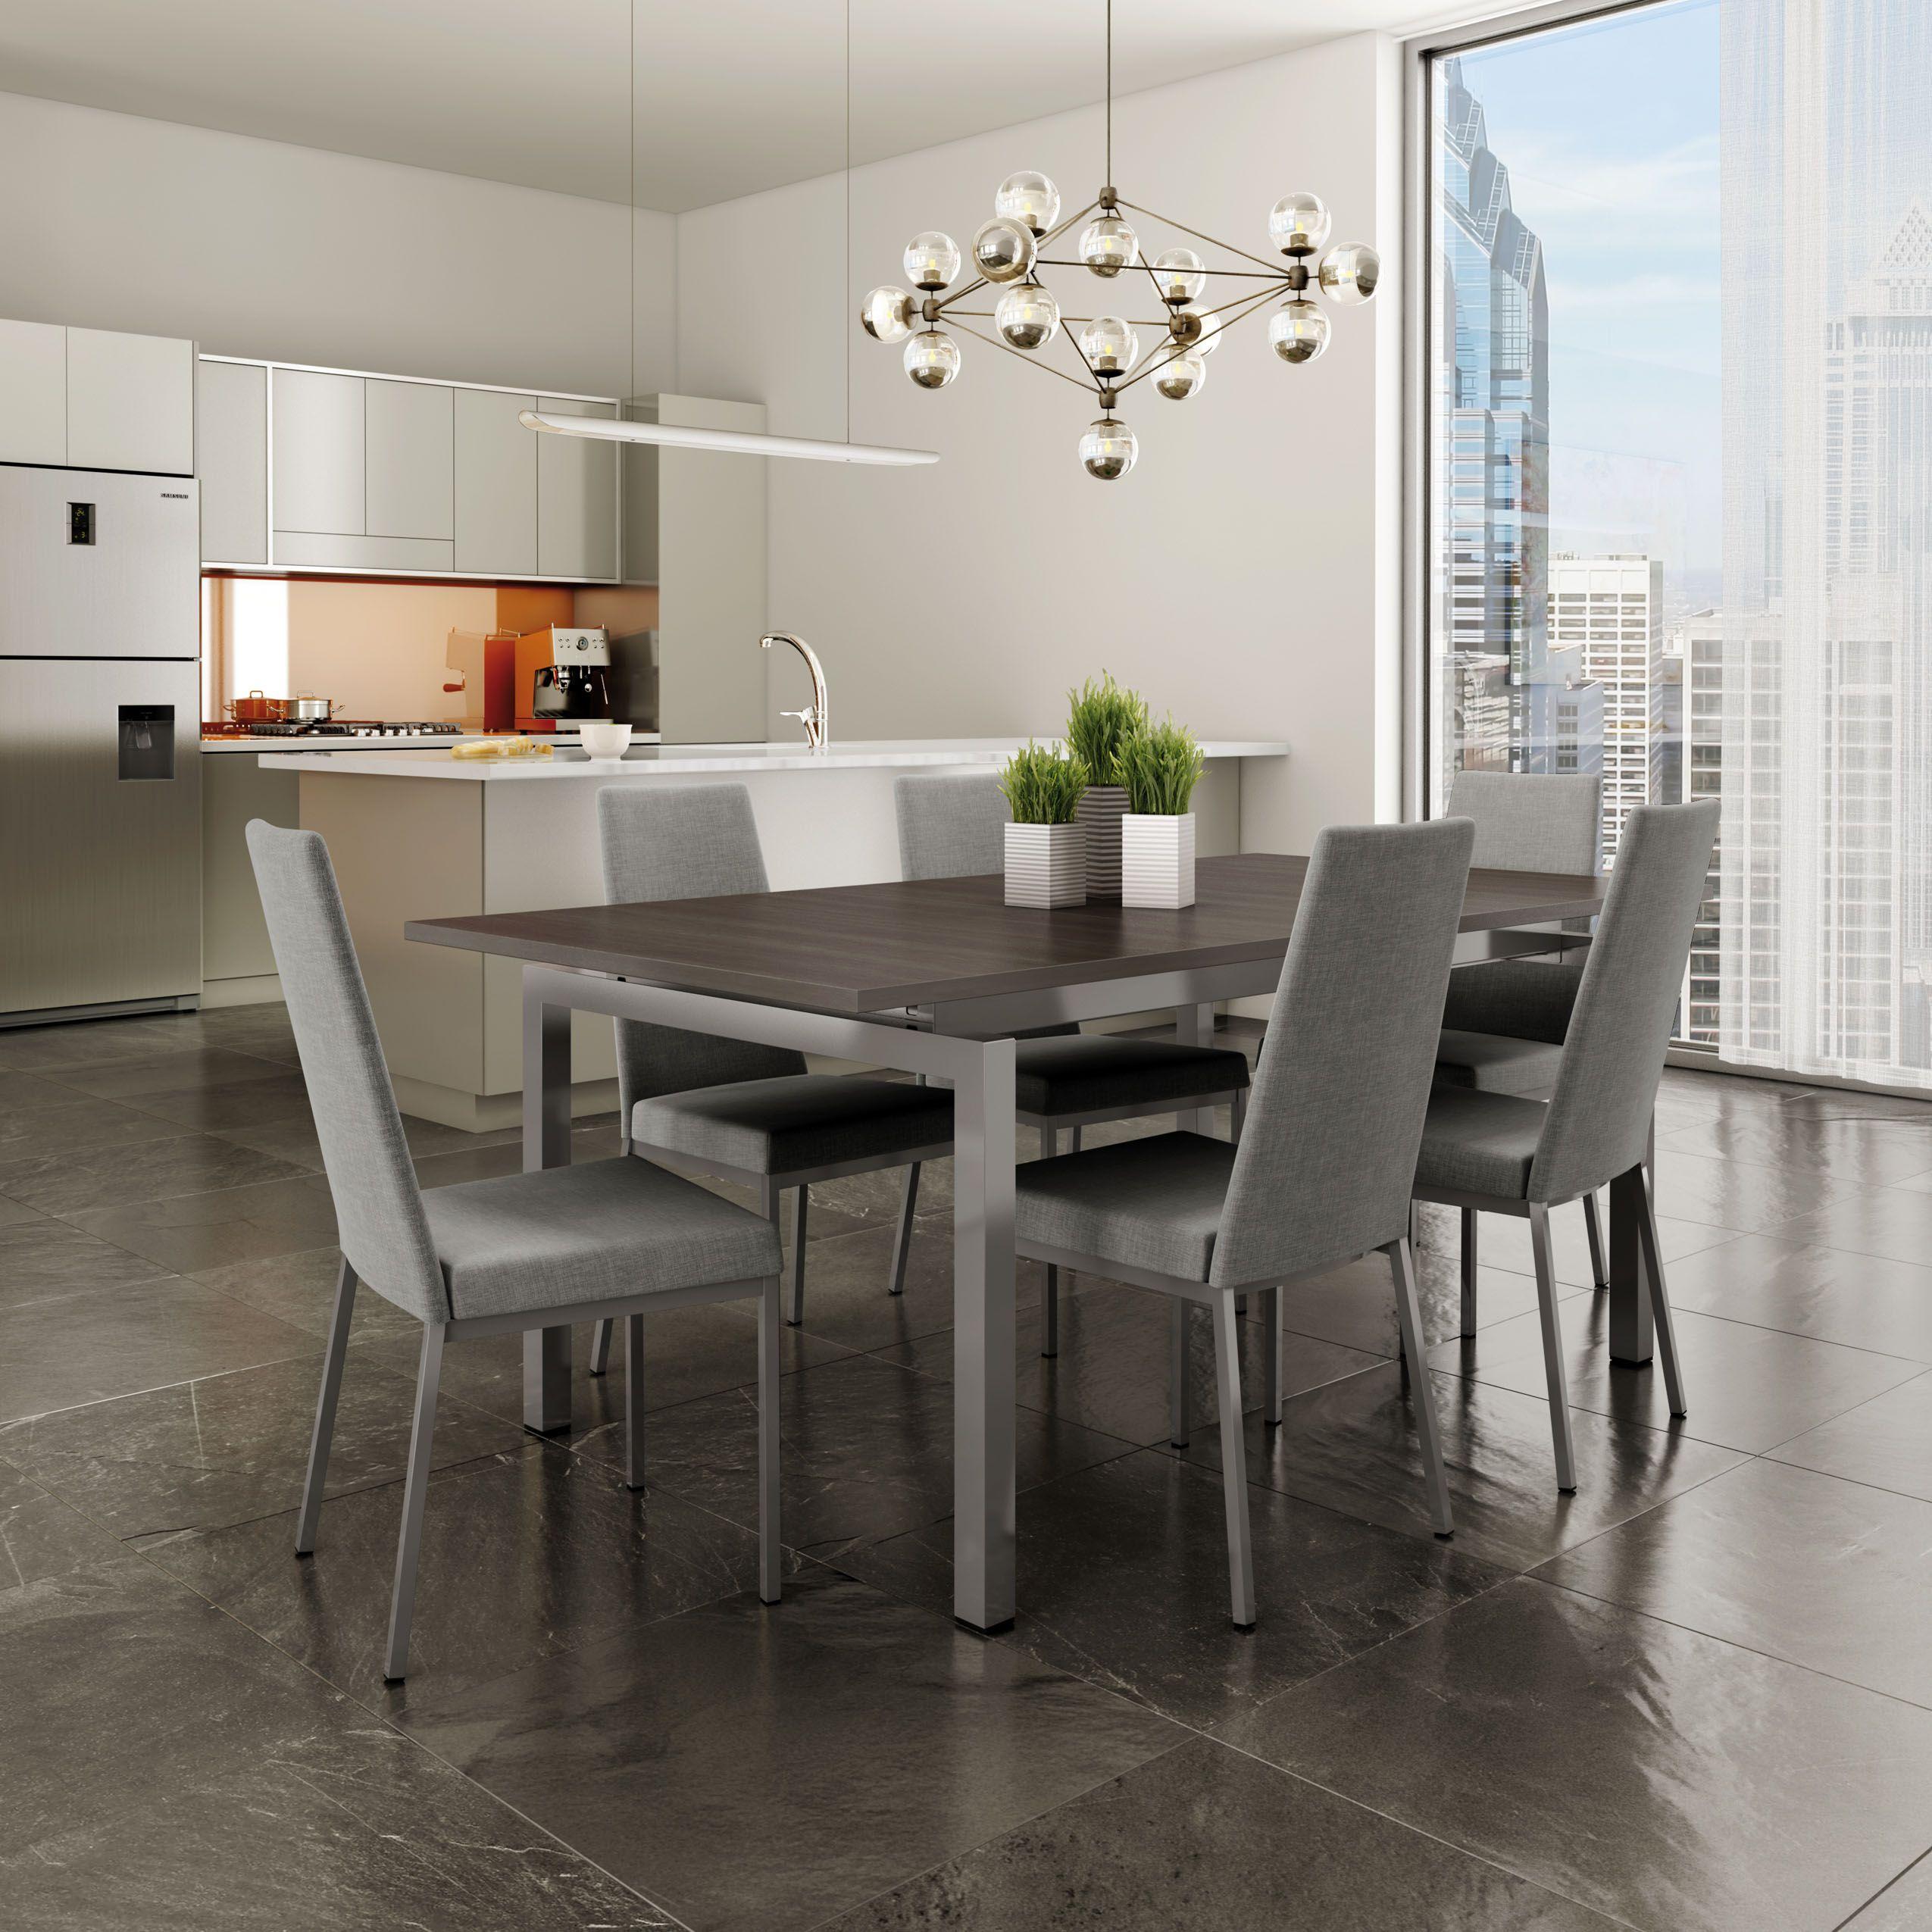 Guns On Kitchen Table: Linea Chair (30320)